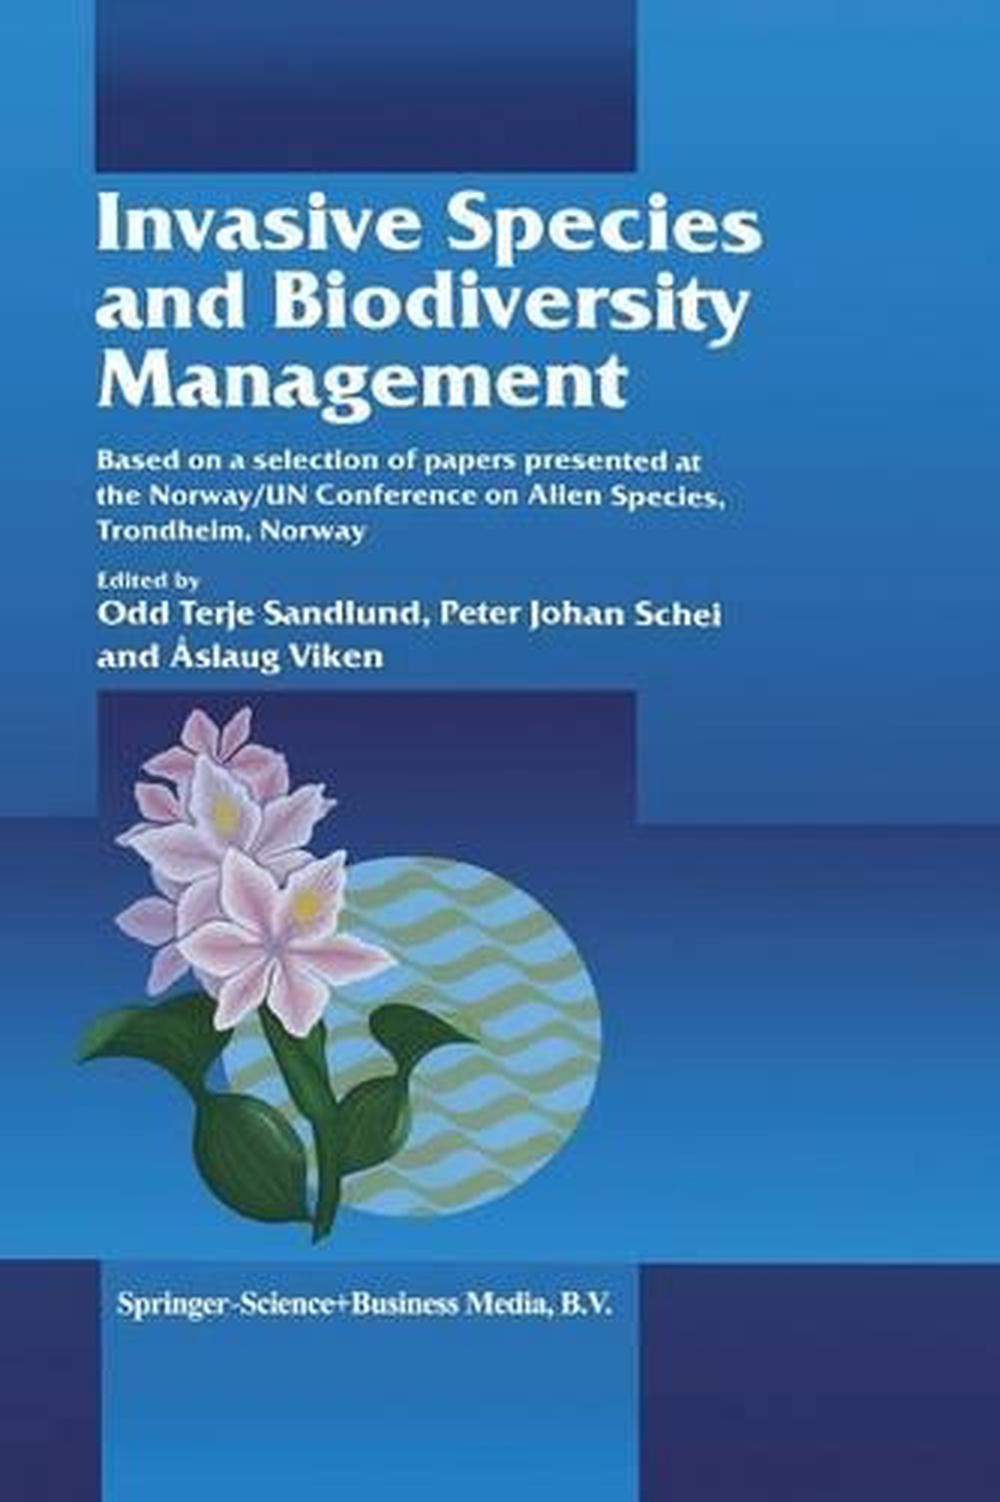 Invasive Species and Biodiversity Management (English) Paperback Book Free Shipp 9780792368762   eBay